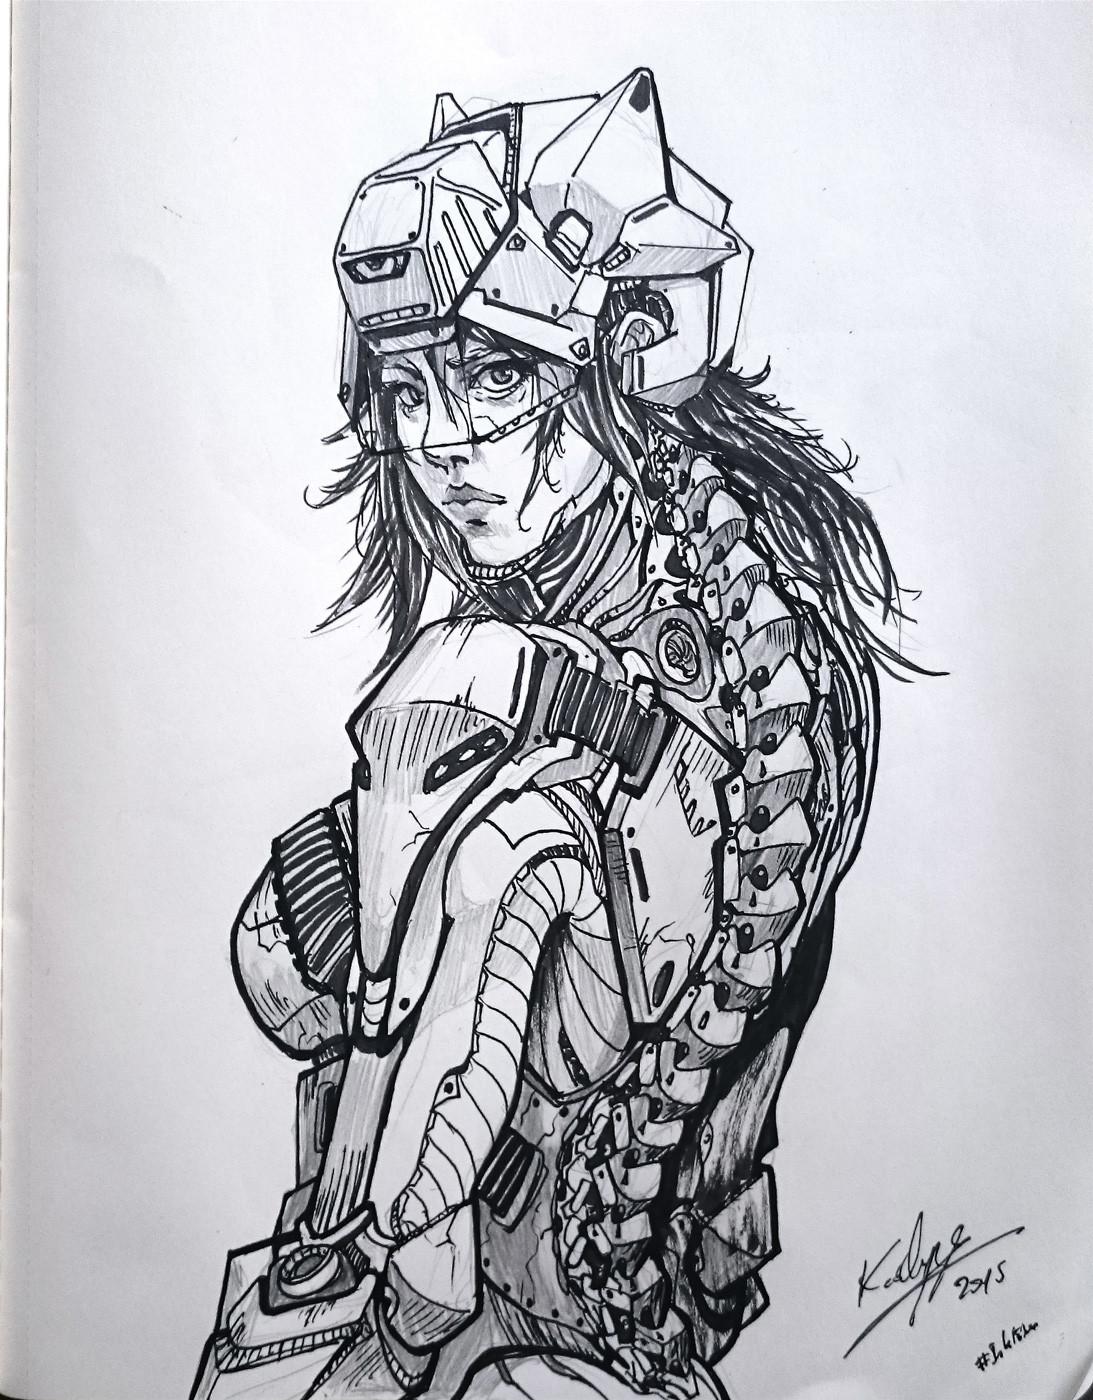 Thibault girard inkto2 k